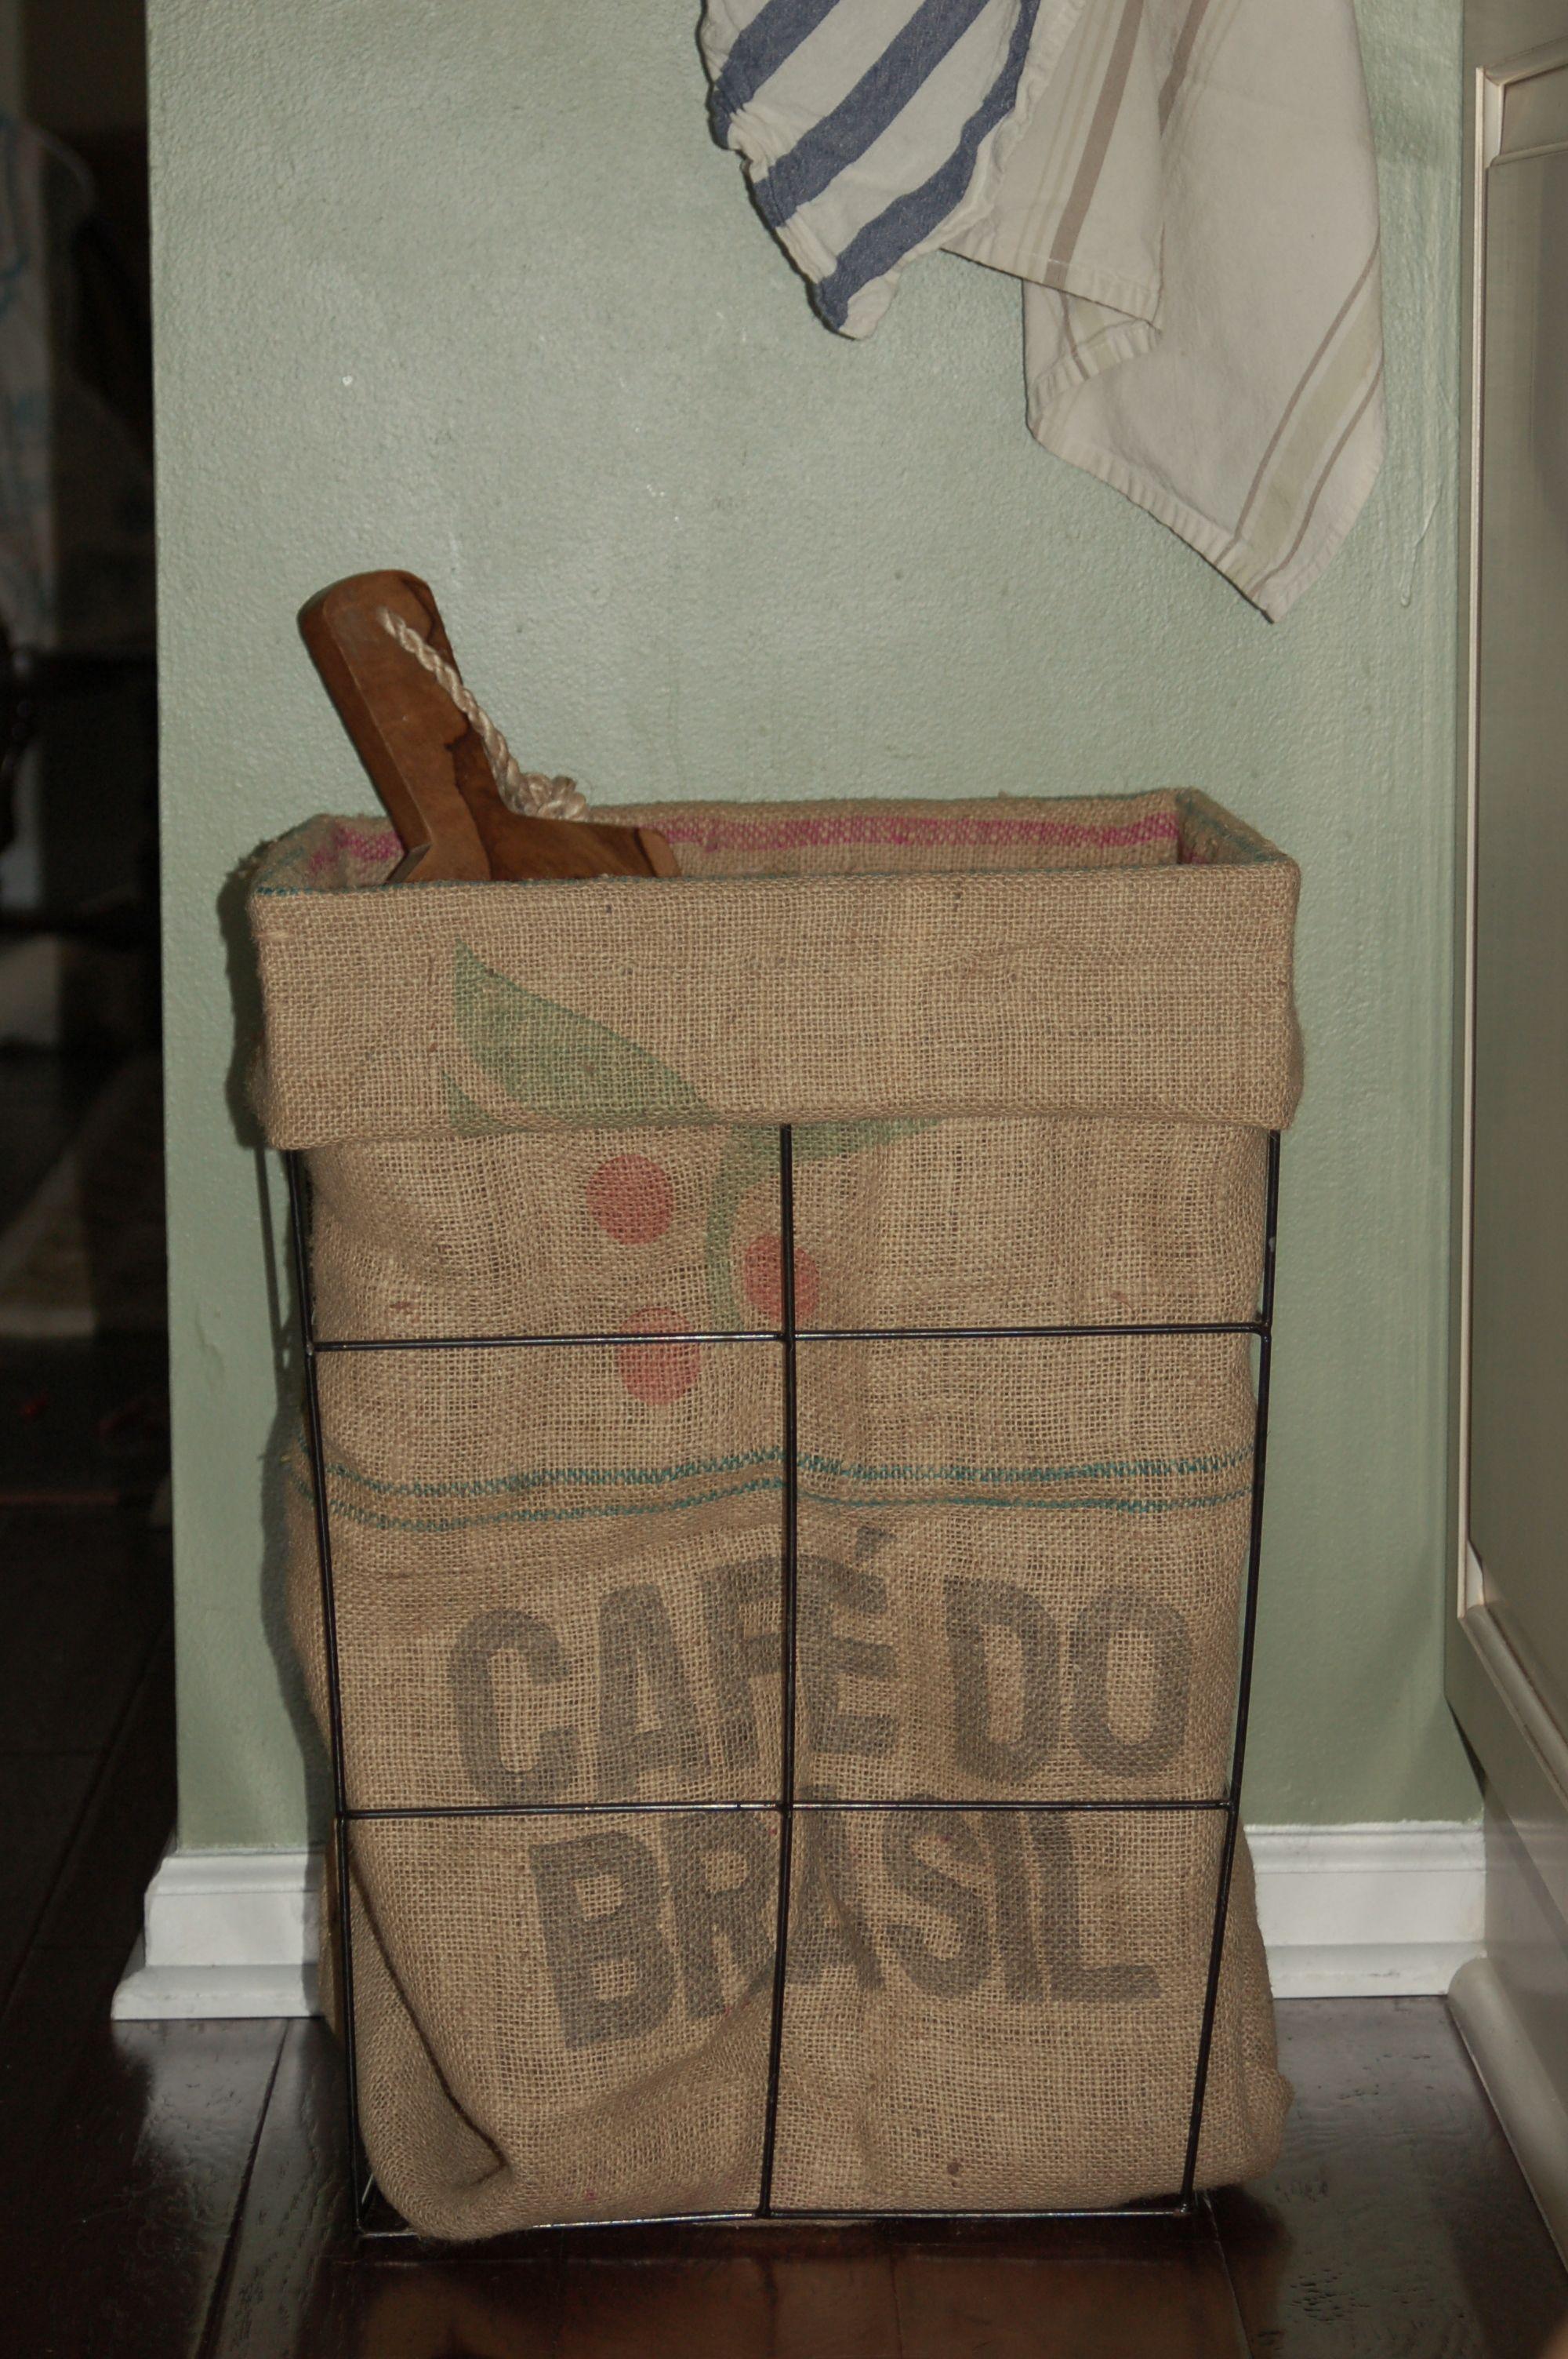 Feed sack wire basket tall laundry basket coffee sacks for Burlap bag craft ideas